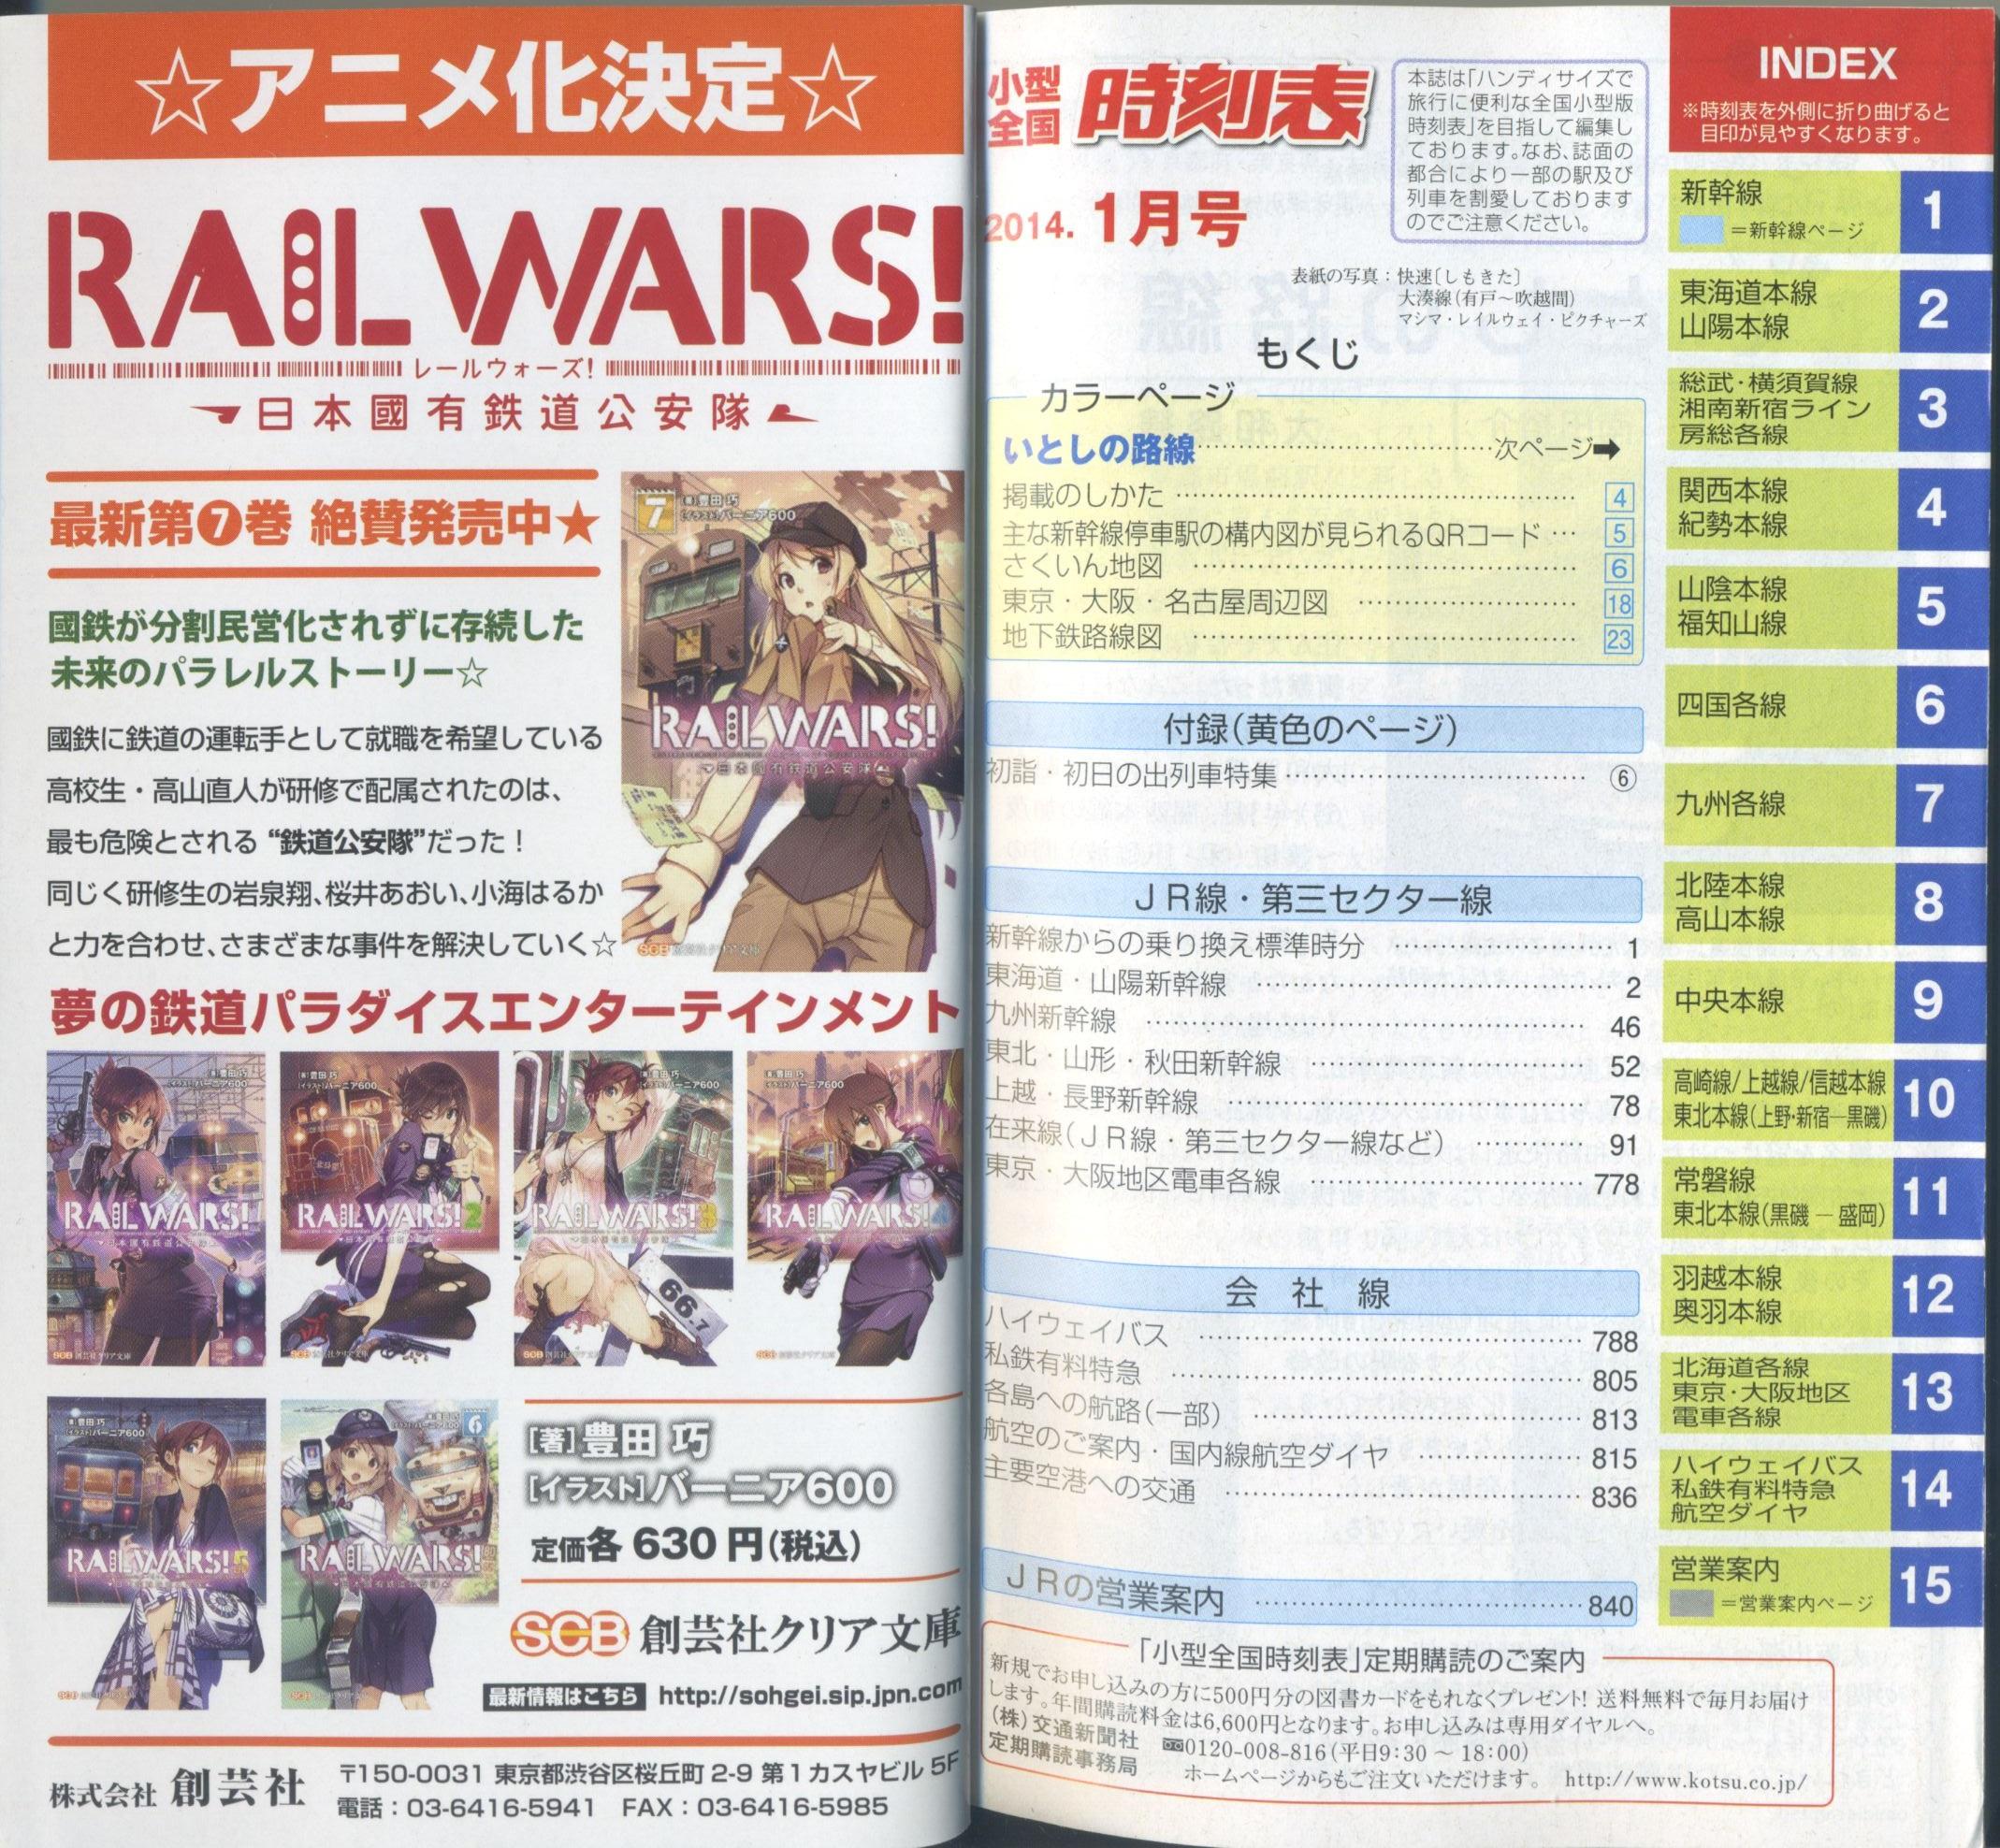 『RAIL WARS!-日本國有鉄道公安隊-』がアニメ化決定